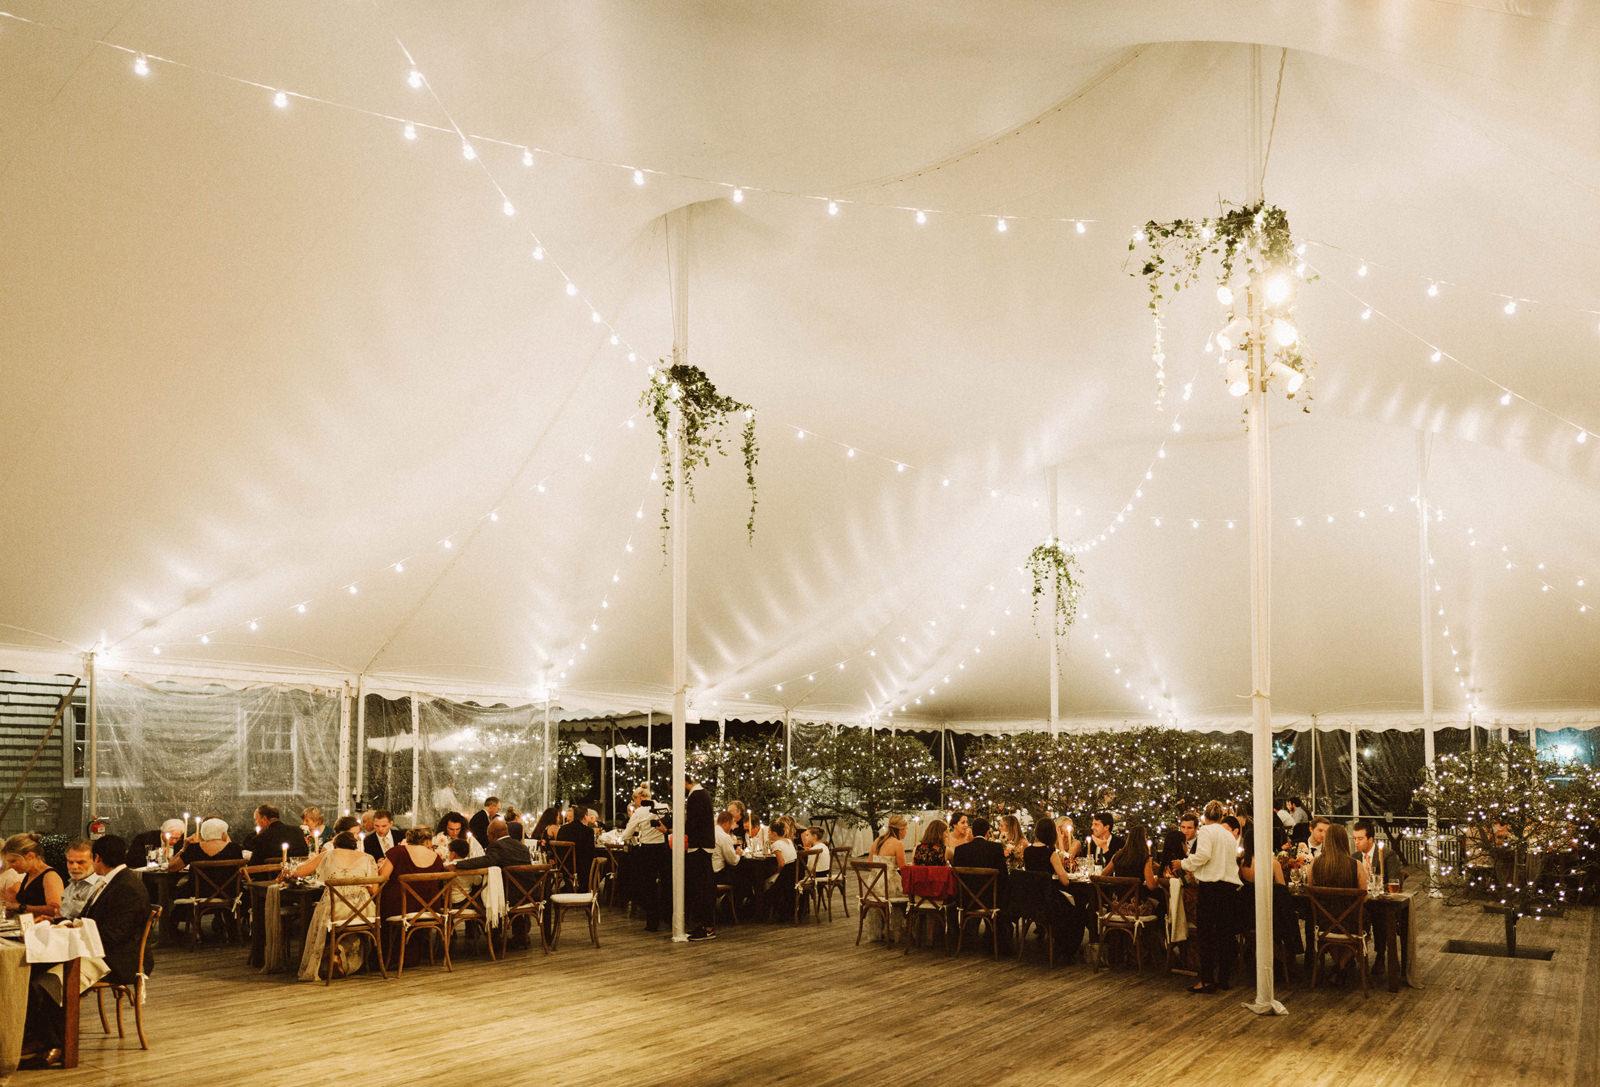 bridgeport-wedding-137 BRIDGEPORT, CONNECTICUT BACKYARD WEDDING